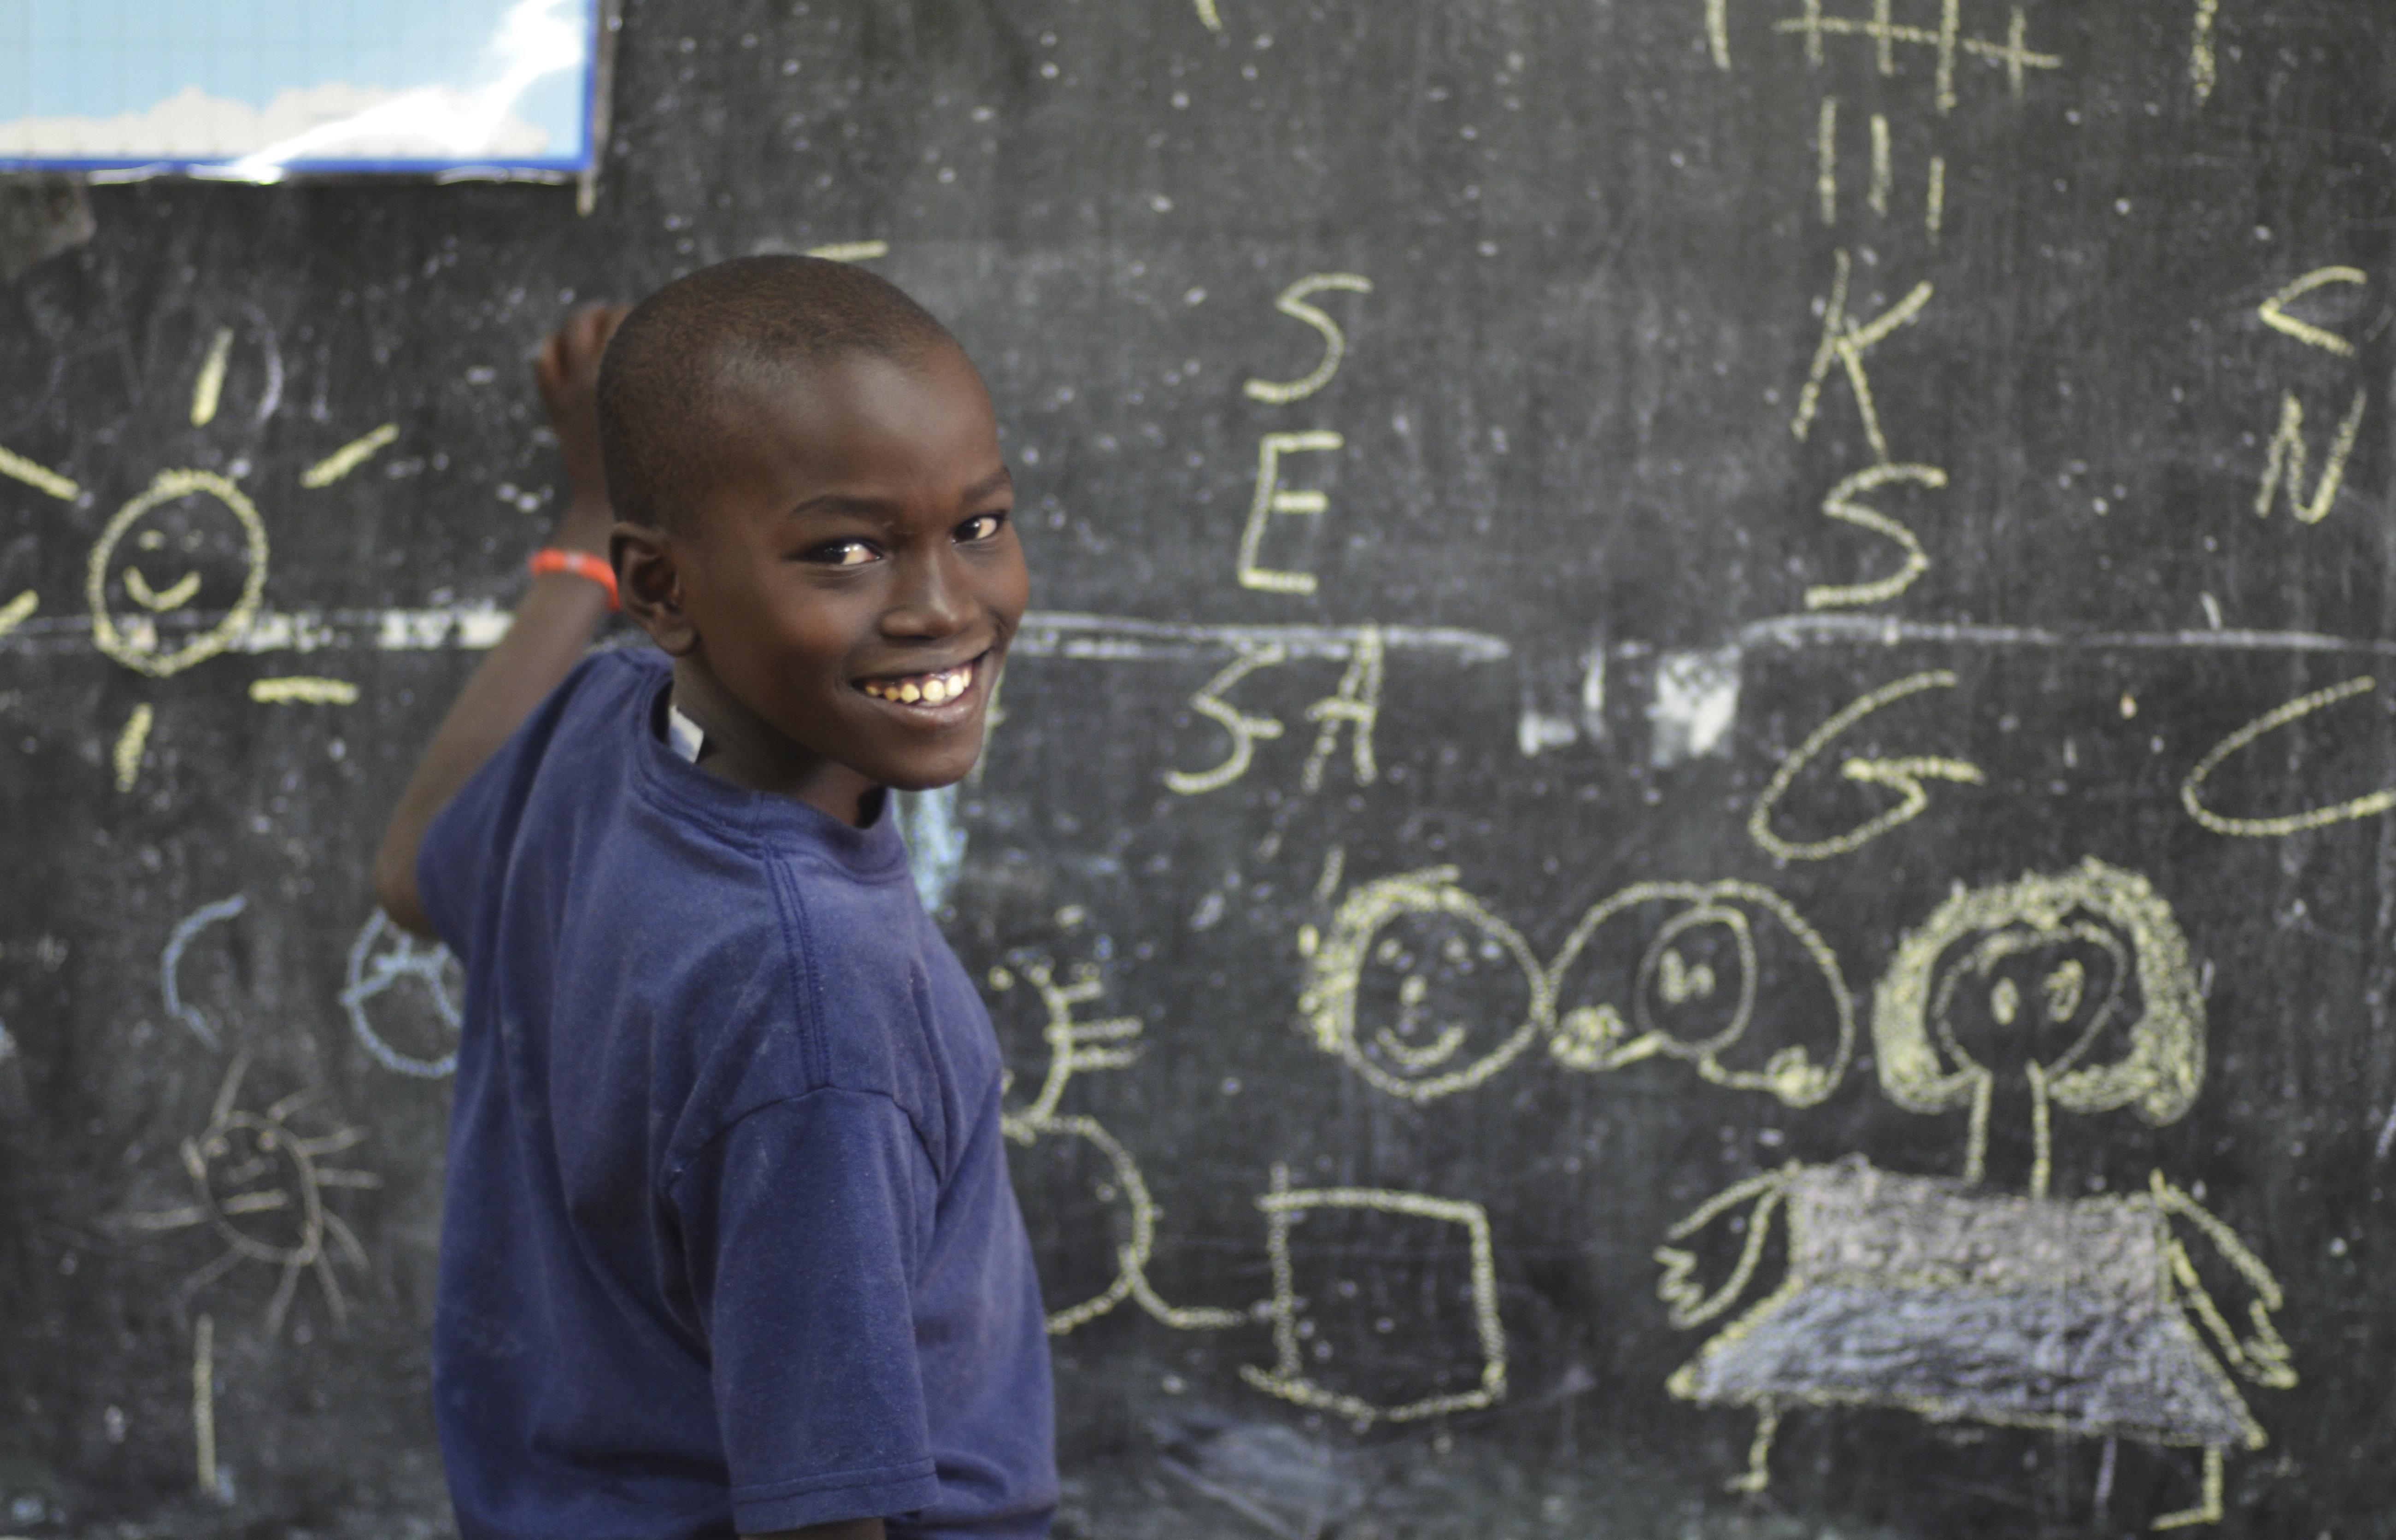 Kenya, Nairobi, little boy writing with chalk on blackboard